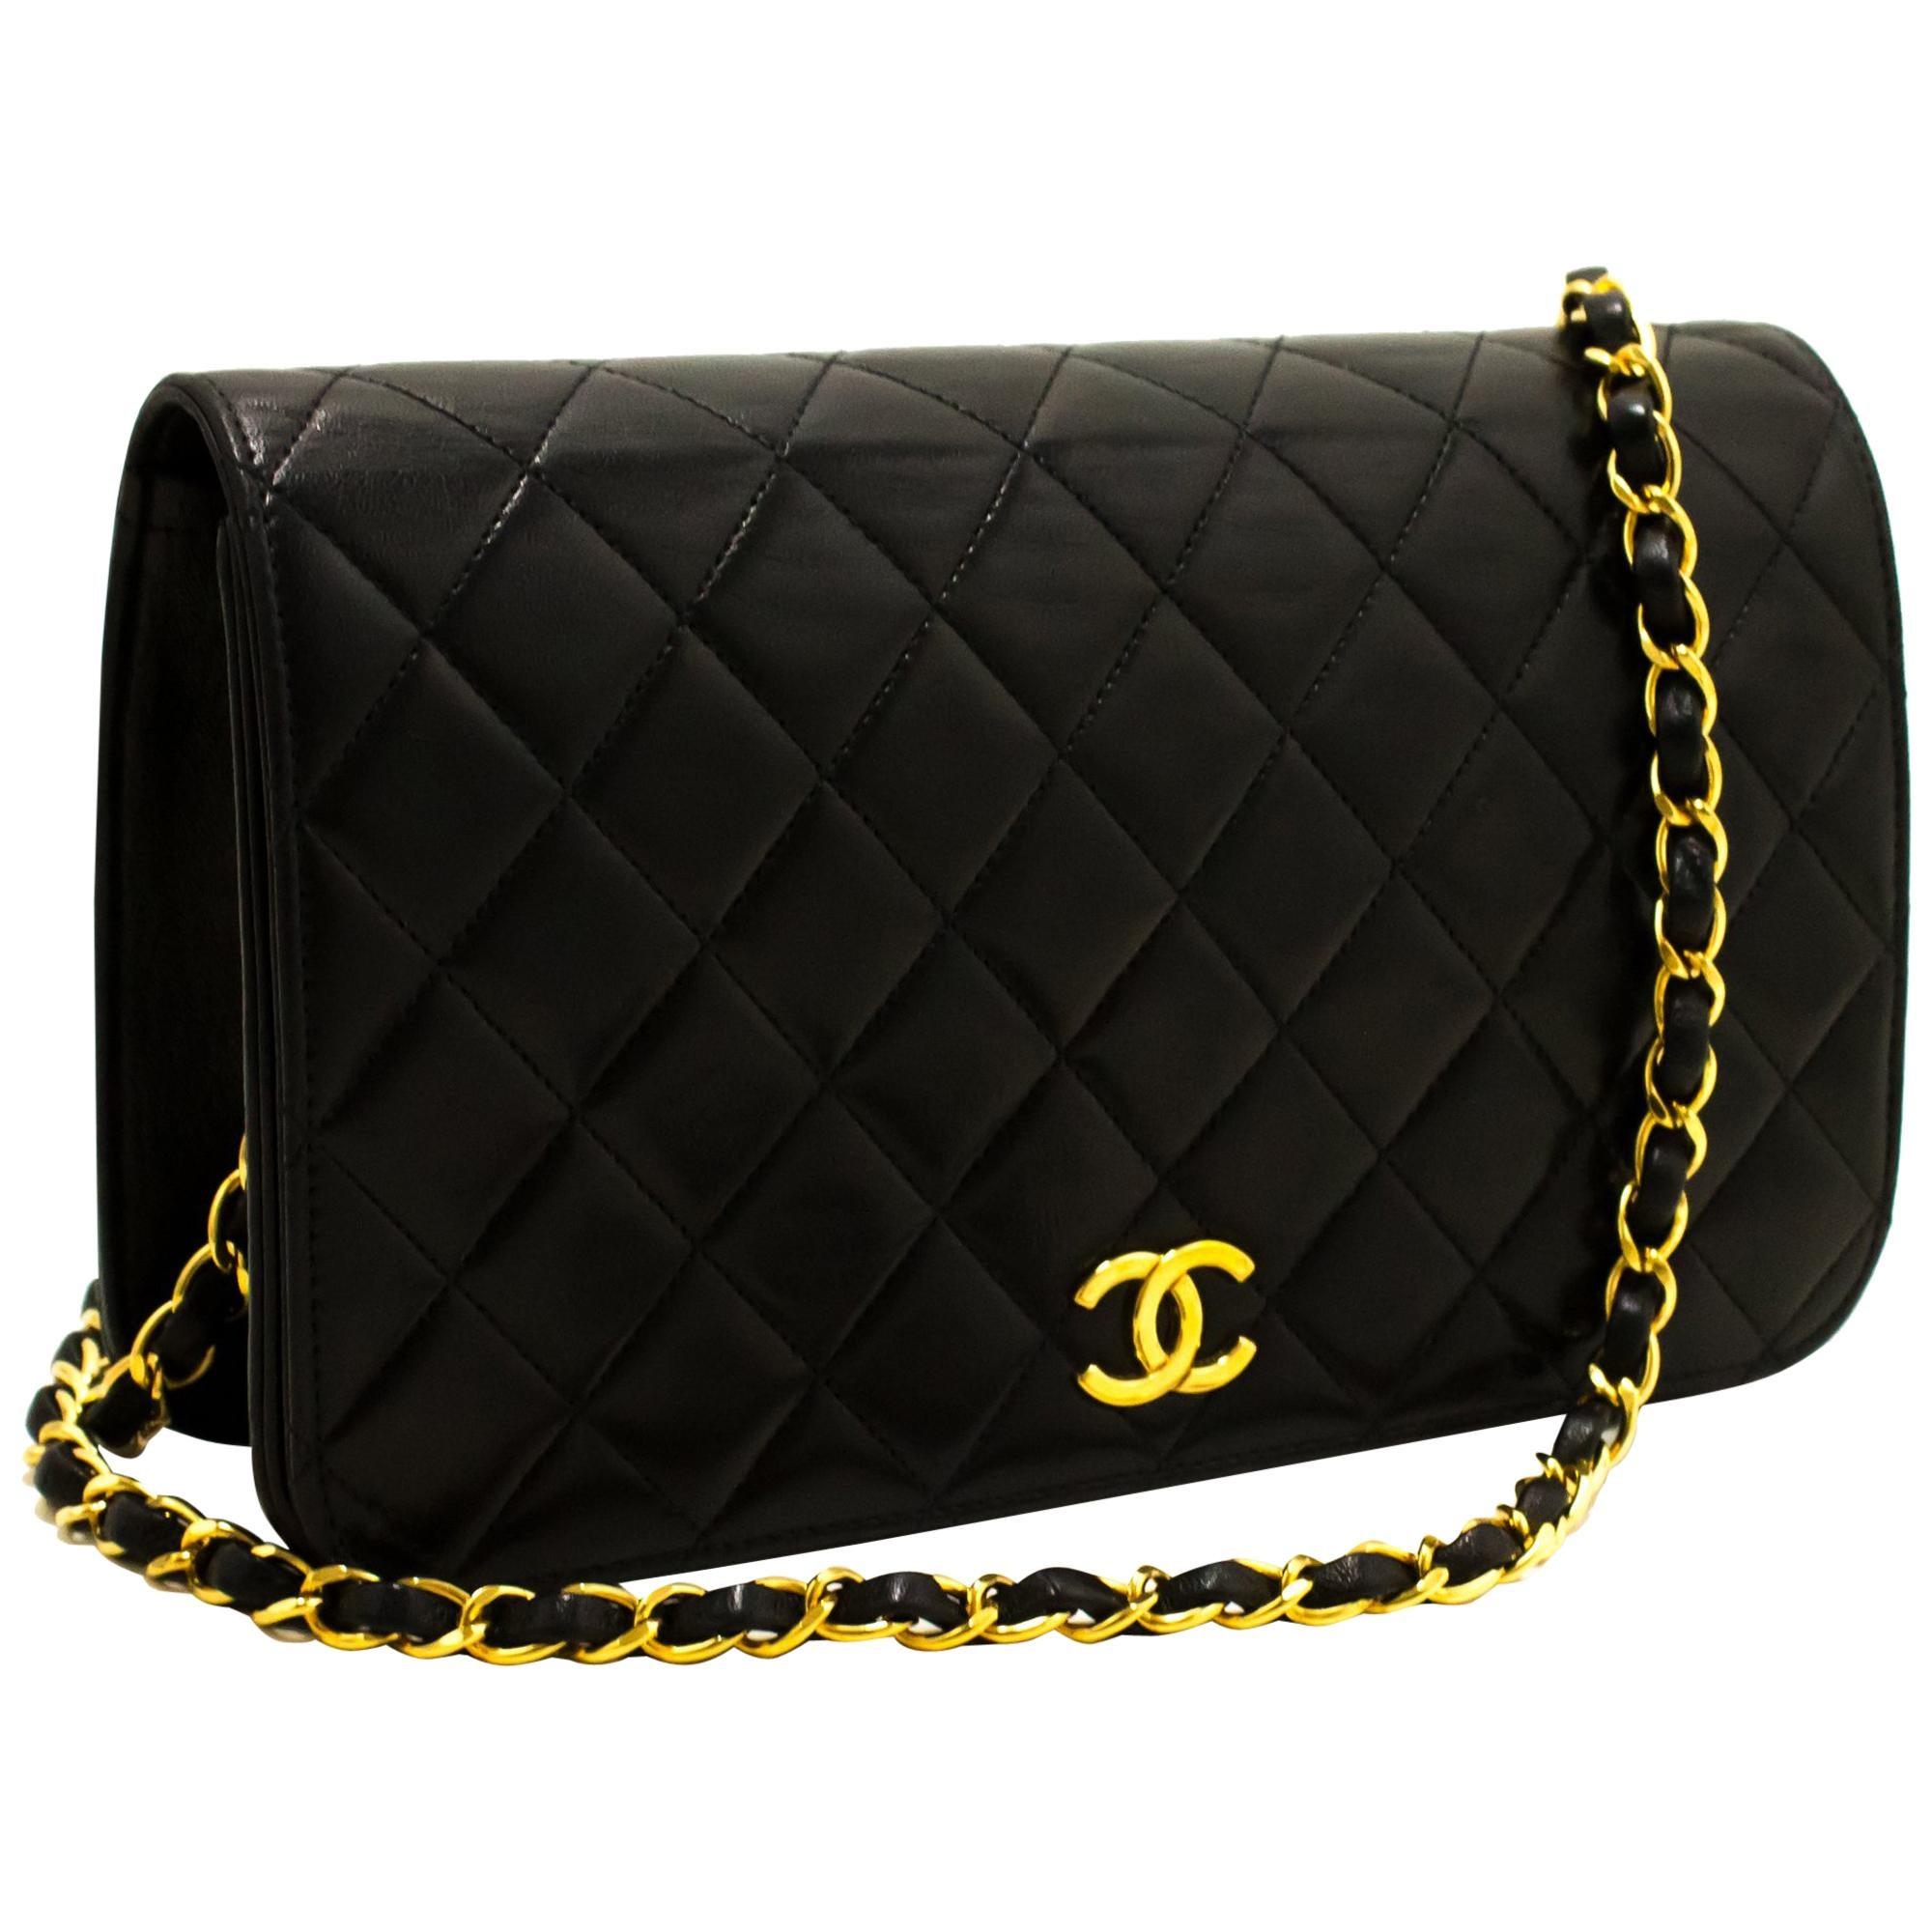 CHANEL Chain Shoulder Bag Black Clutch Flap